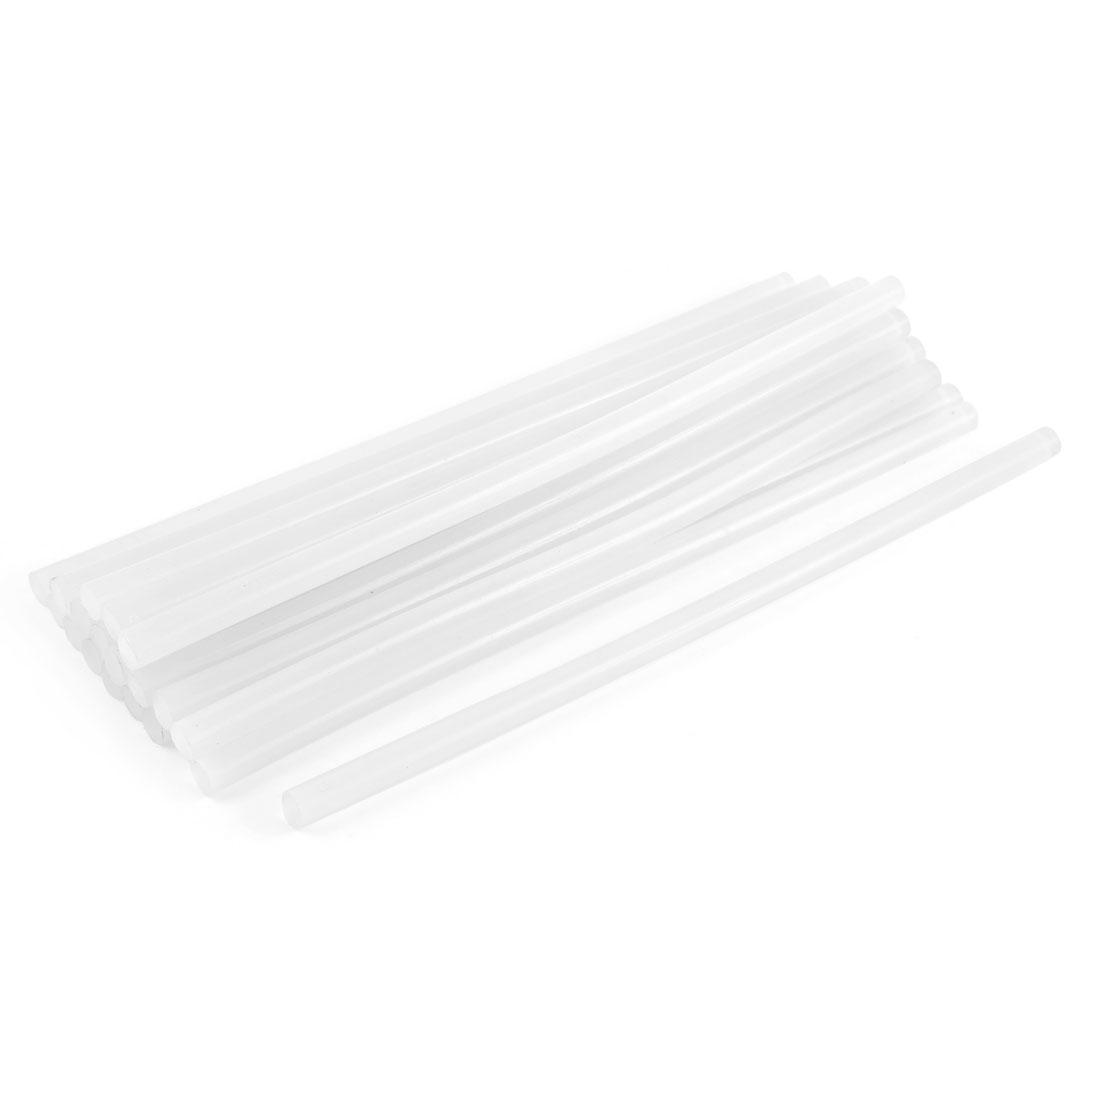 20 Pcs Clear Craft Model Bonding Adhesive Hot Melt Glue Sticks 11mm x 300mm